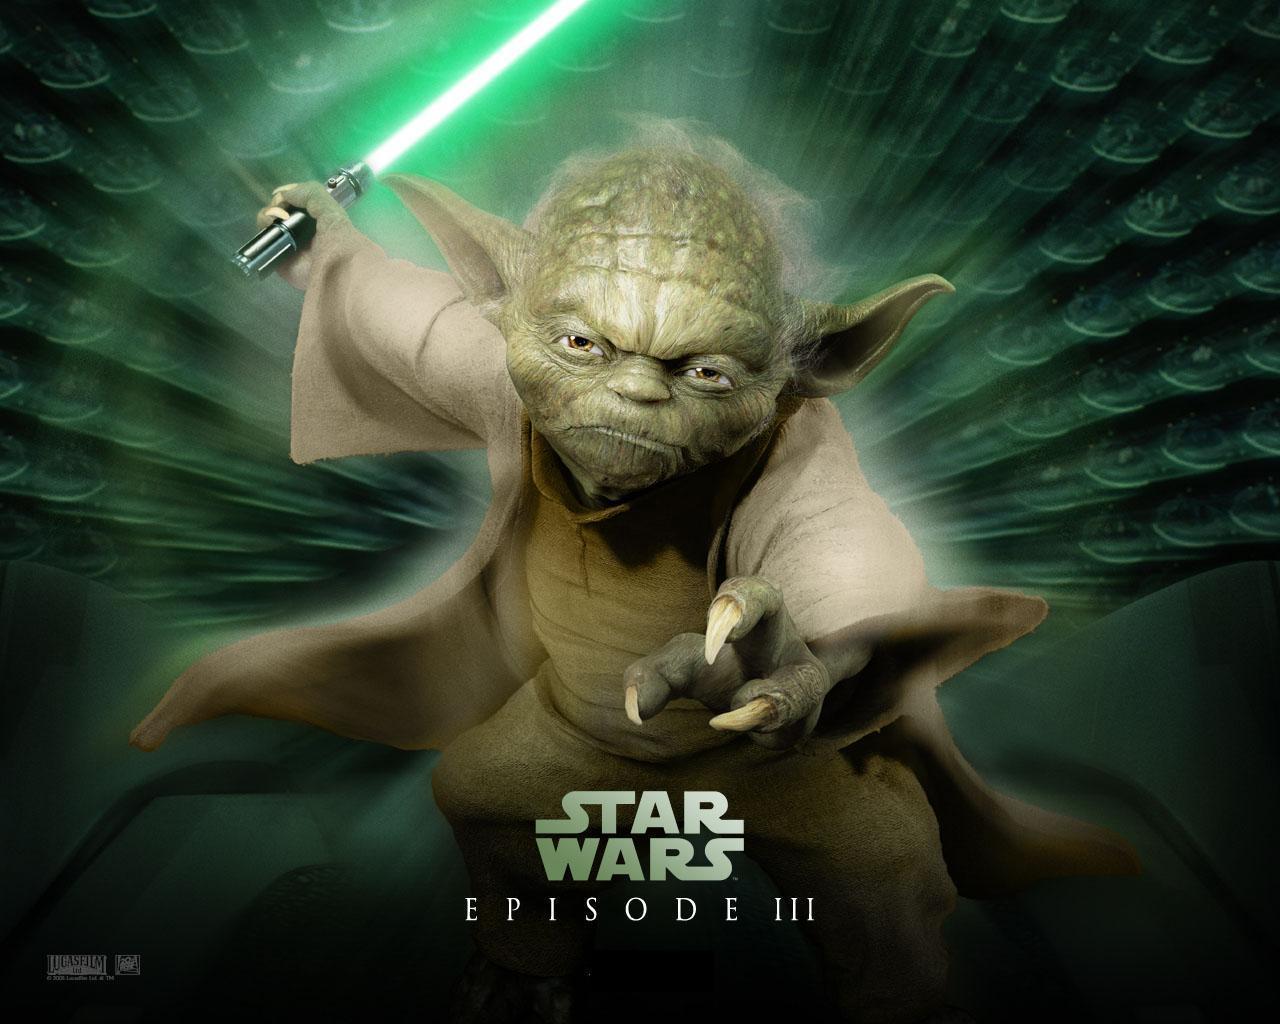 kino master joda zvezdnye vojny star wars 10953 - Детский день рождения